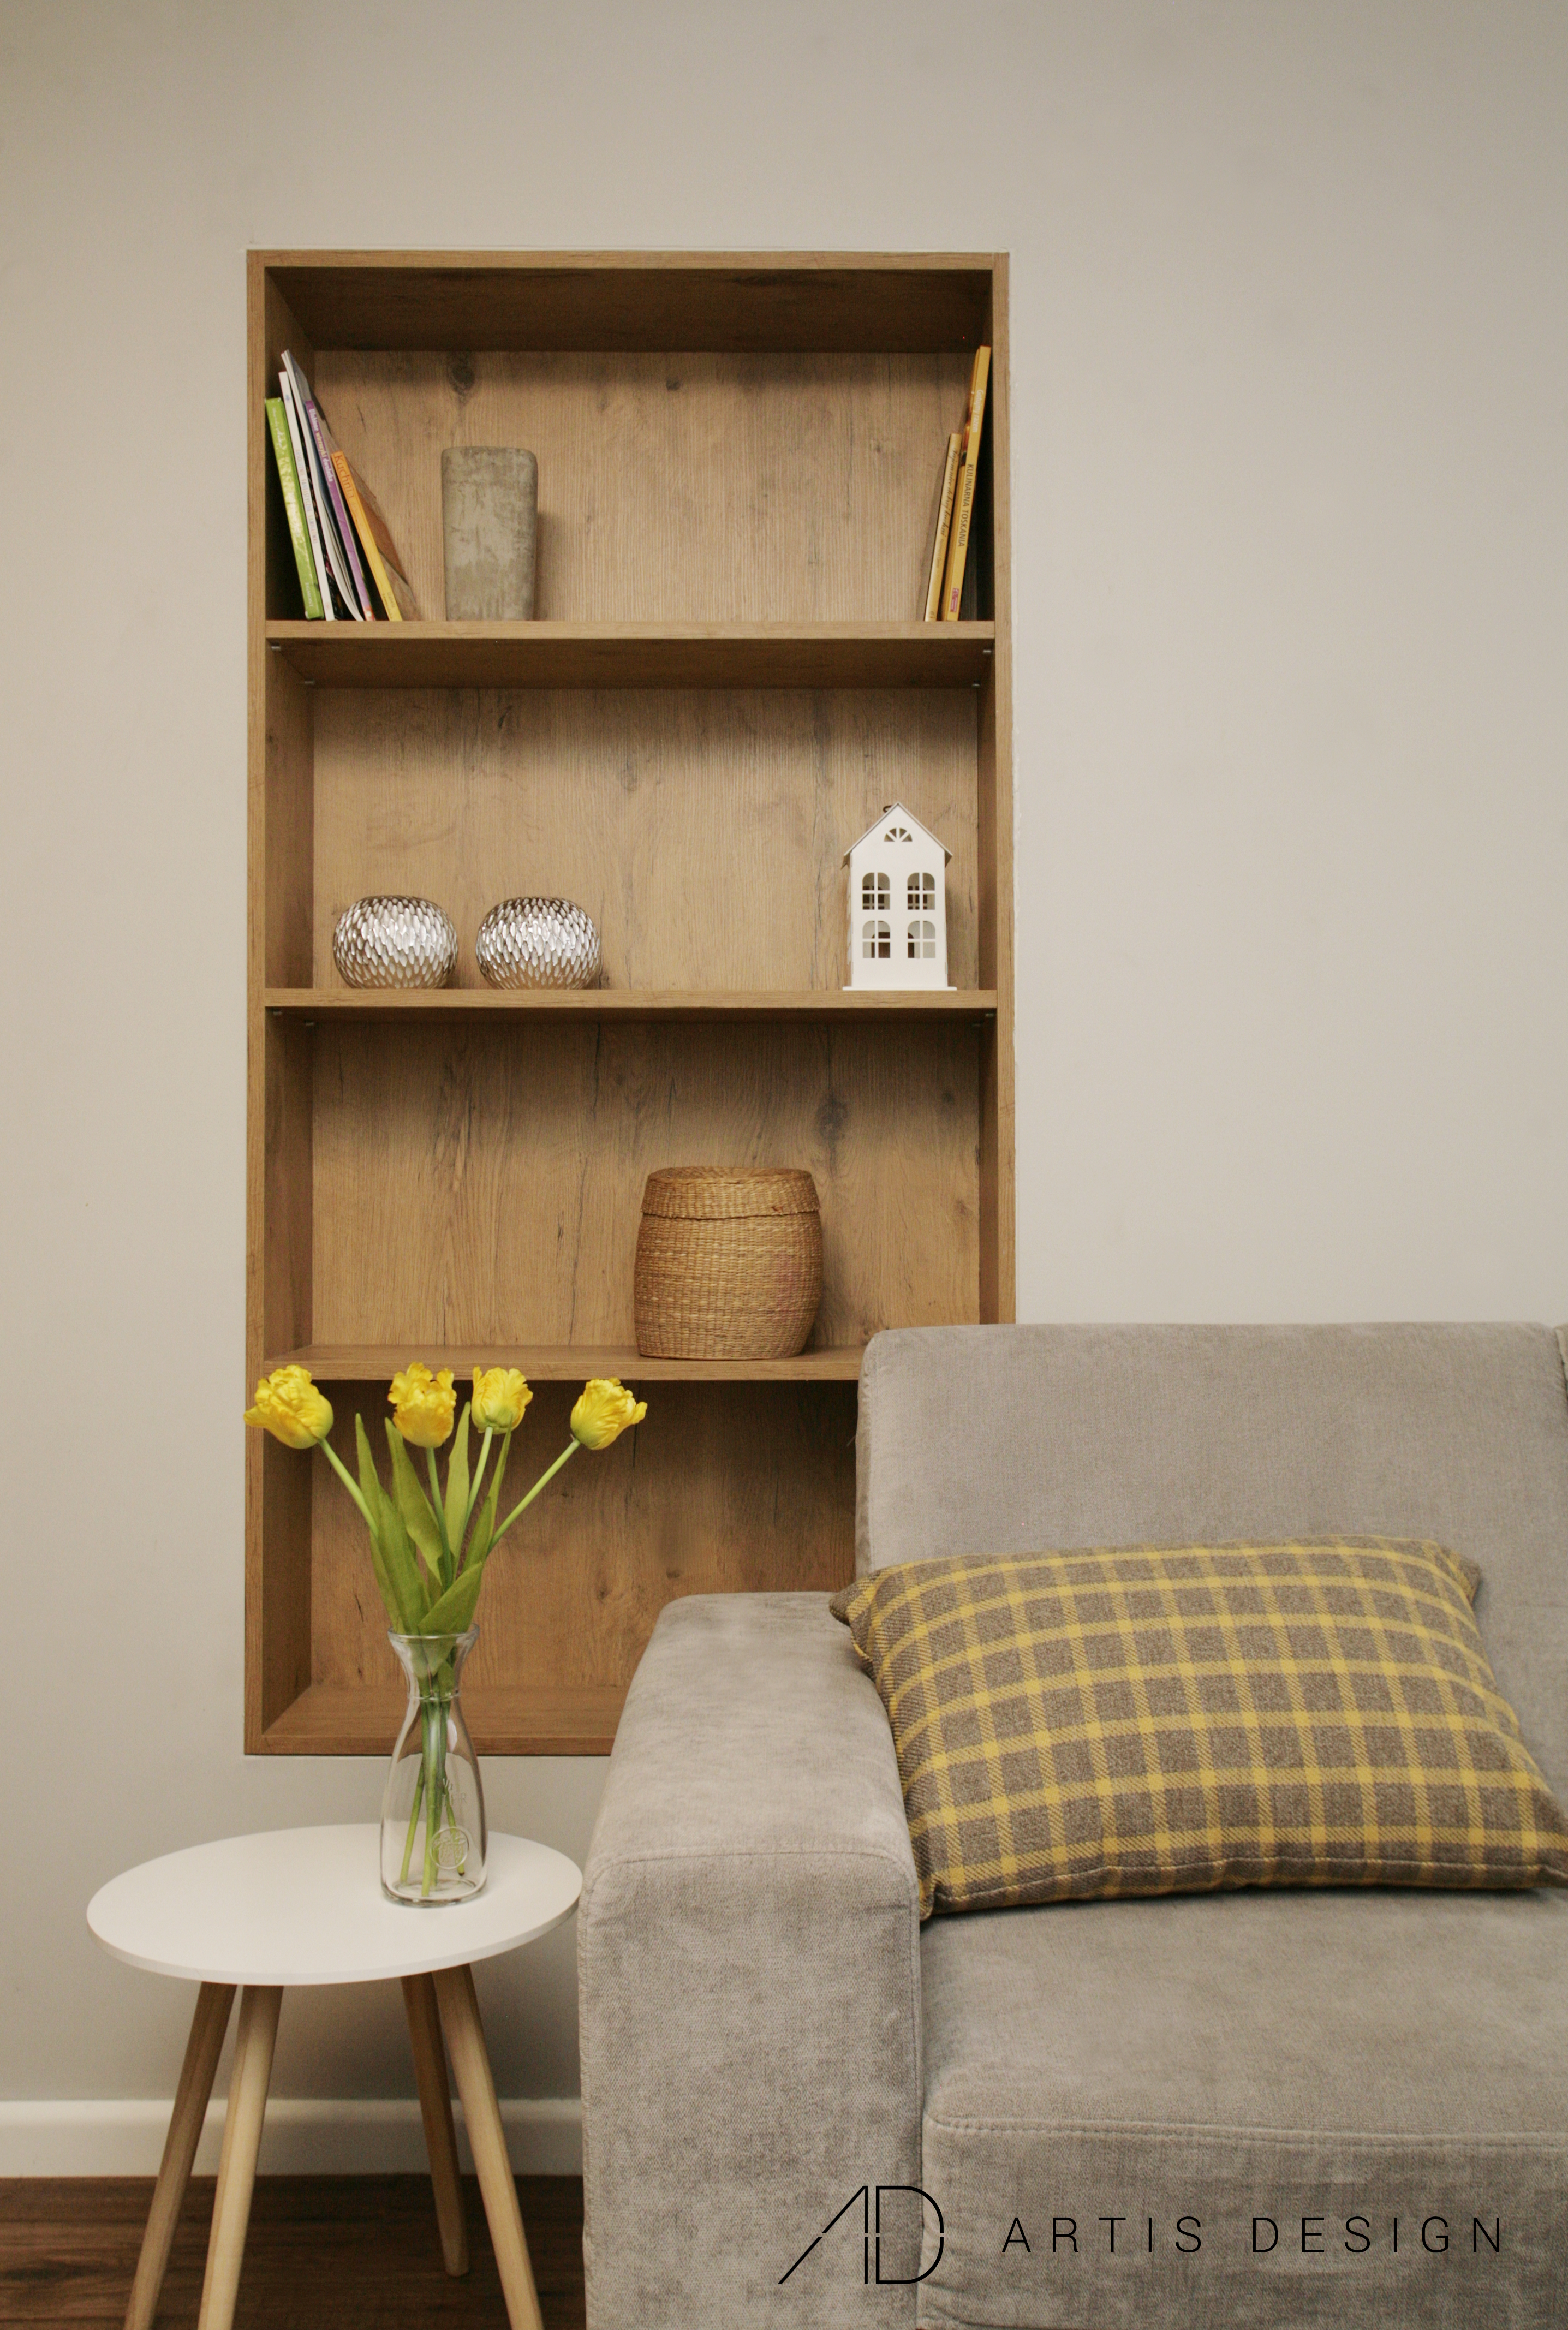 Projekt: Lewitująca kuchnia sercem domu   Artis Design: Studio projektowe